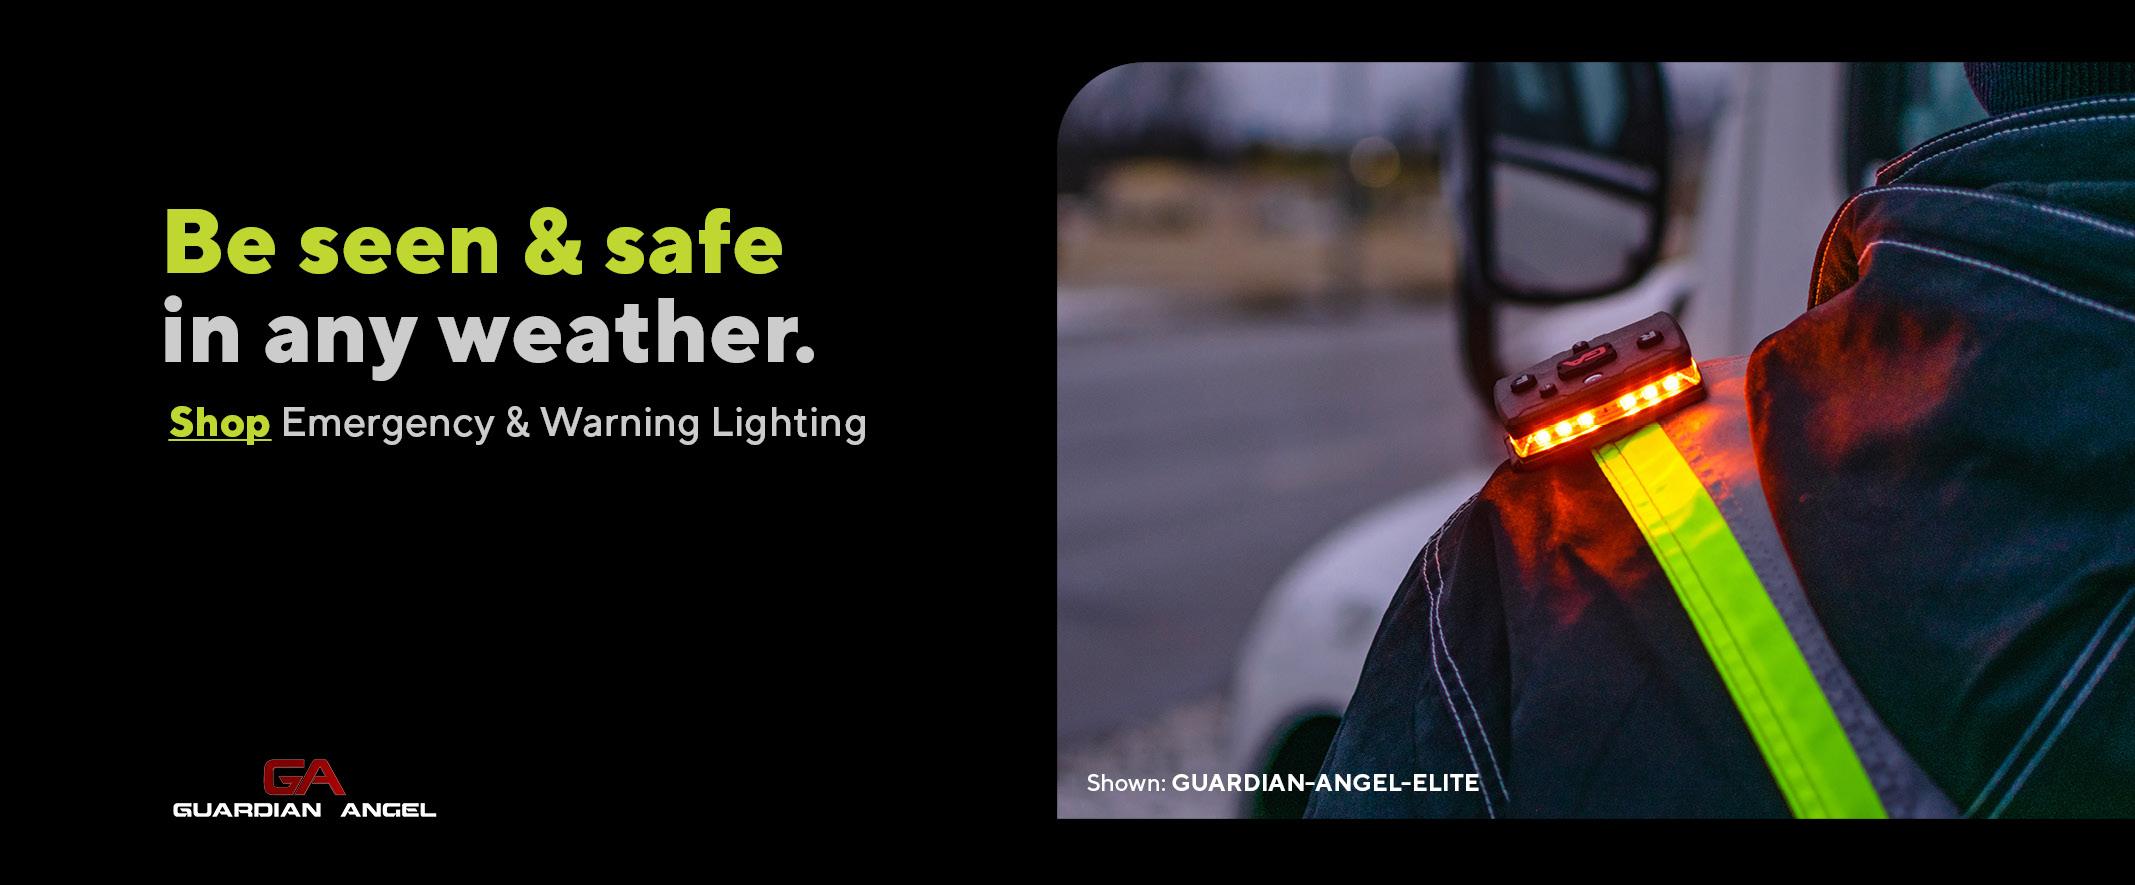 Rotator_Ad_Home_Page_emergency-warning-lighting_1025x425